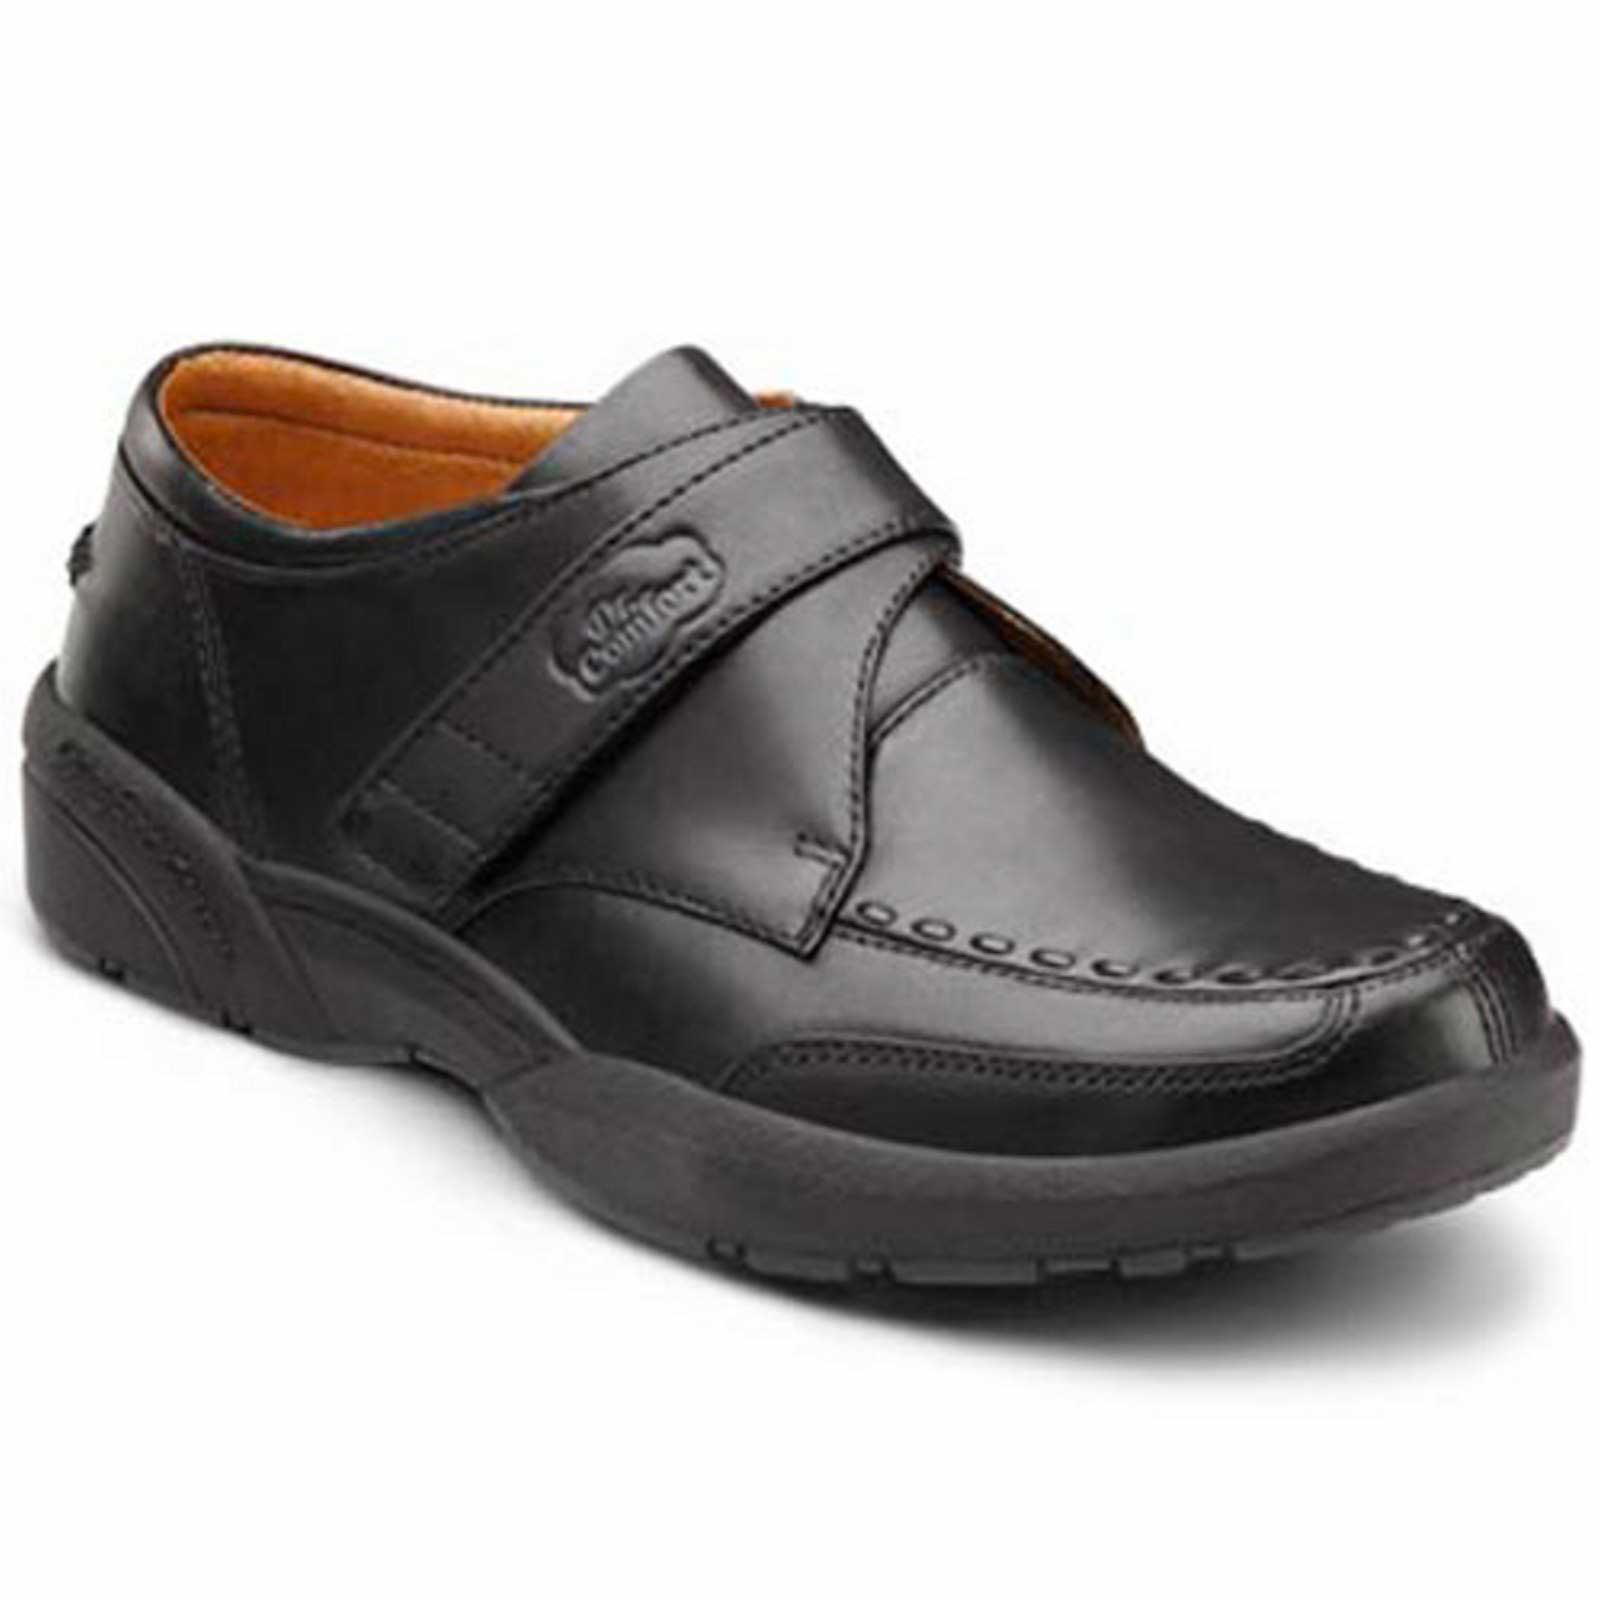 dr. Comfort orthopedic Shoes | Dr Comfort Orthopedic Sneaker